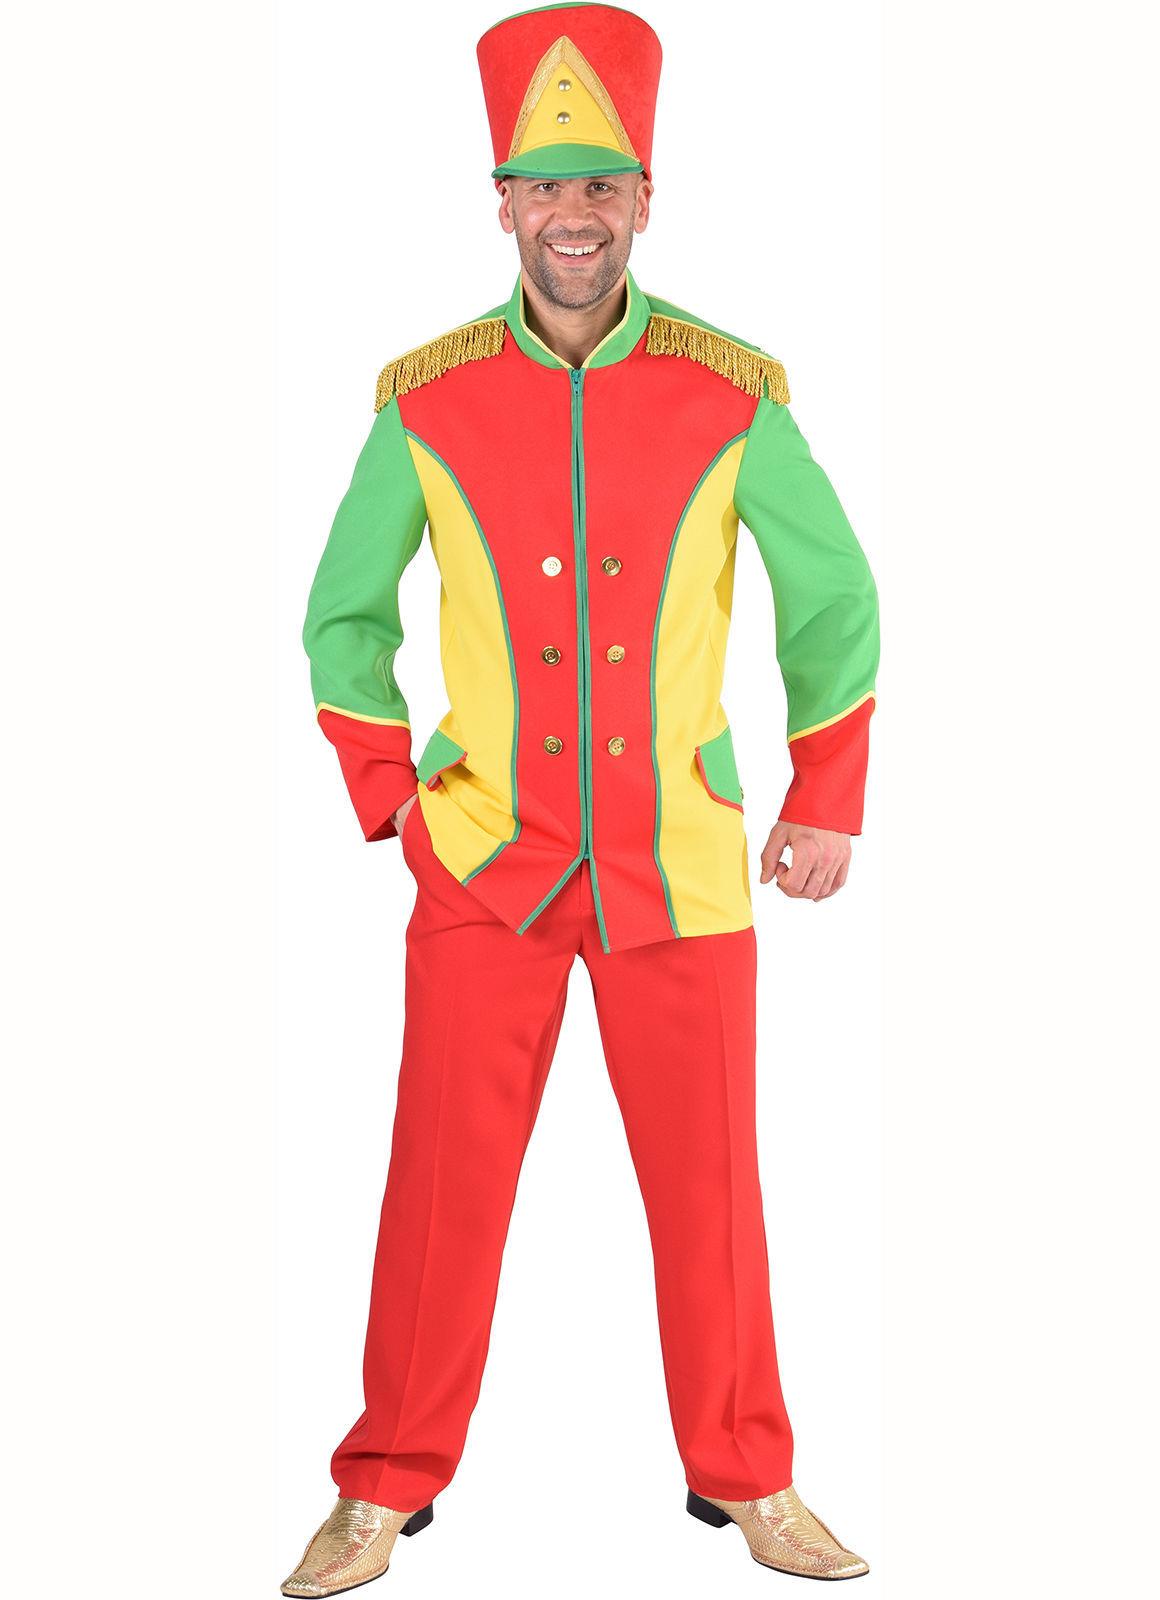 Colorful Toy Soldier /Circus Jacket / Male Majorette Dance Jacket   S-XXL